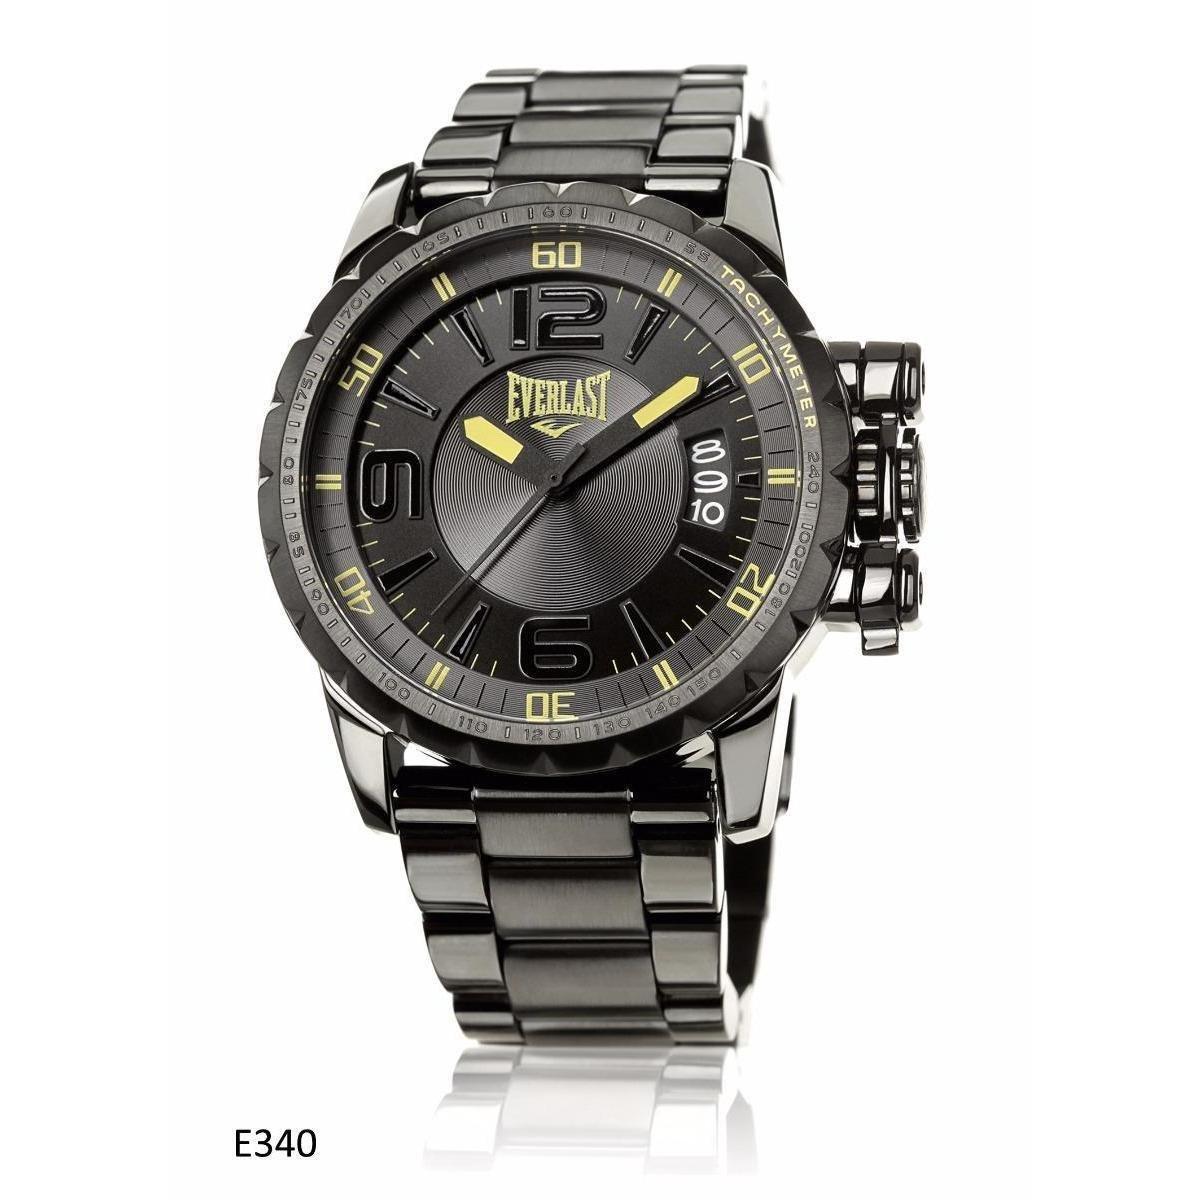 752dc21b9b3 Relógio Pulso Everlast Analógico E340 Masculino - Preto - Compre Agora